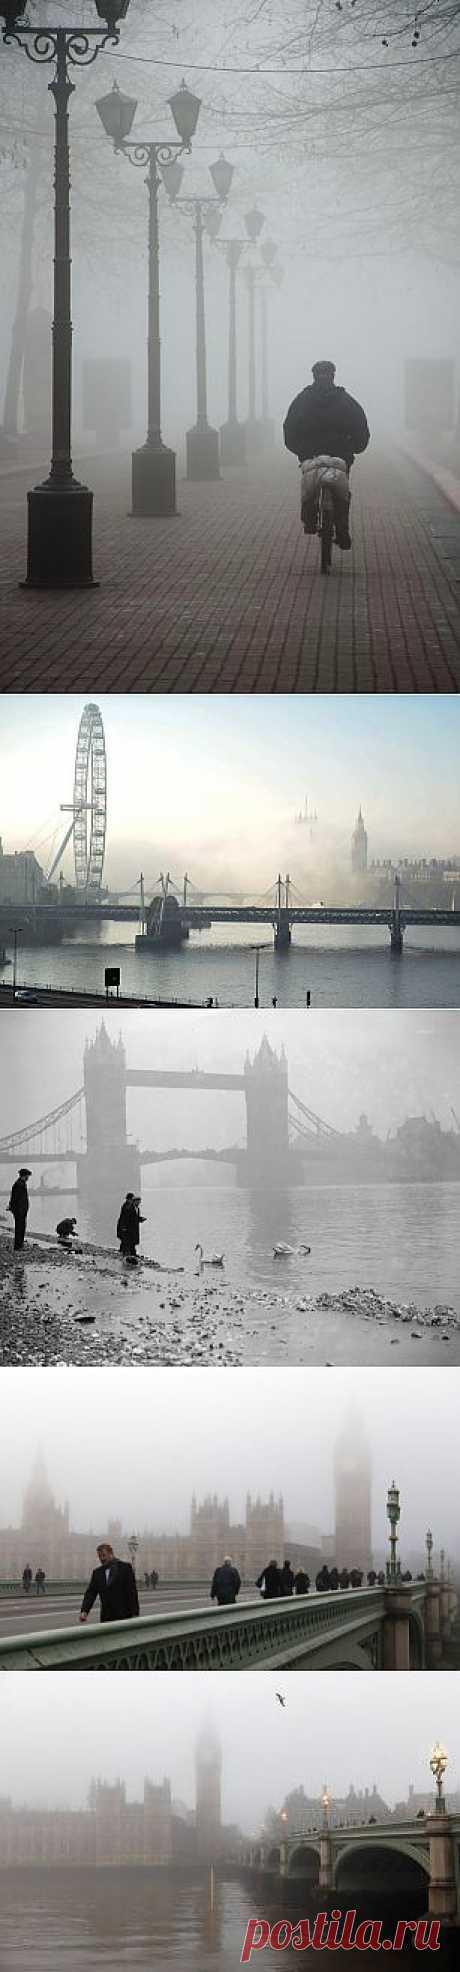 Почему Англия - Туманный Альбион?